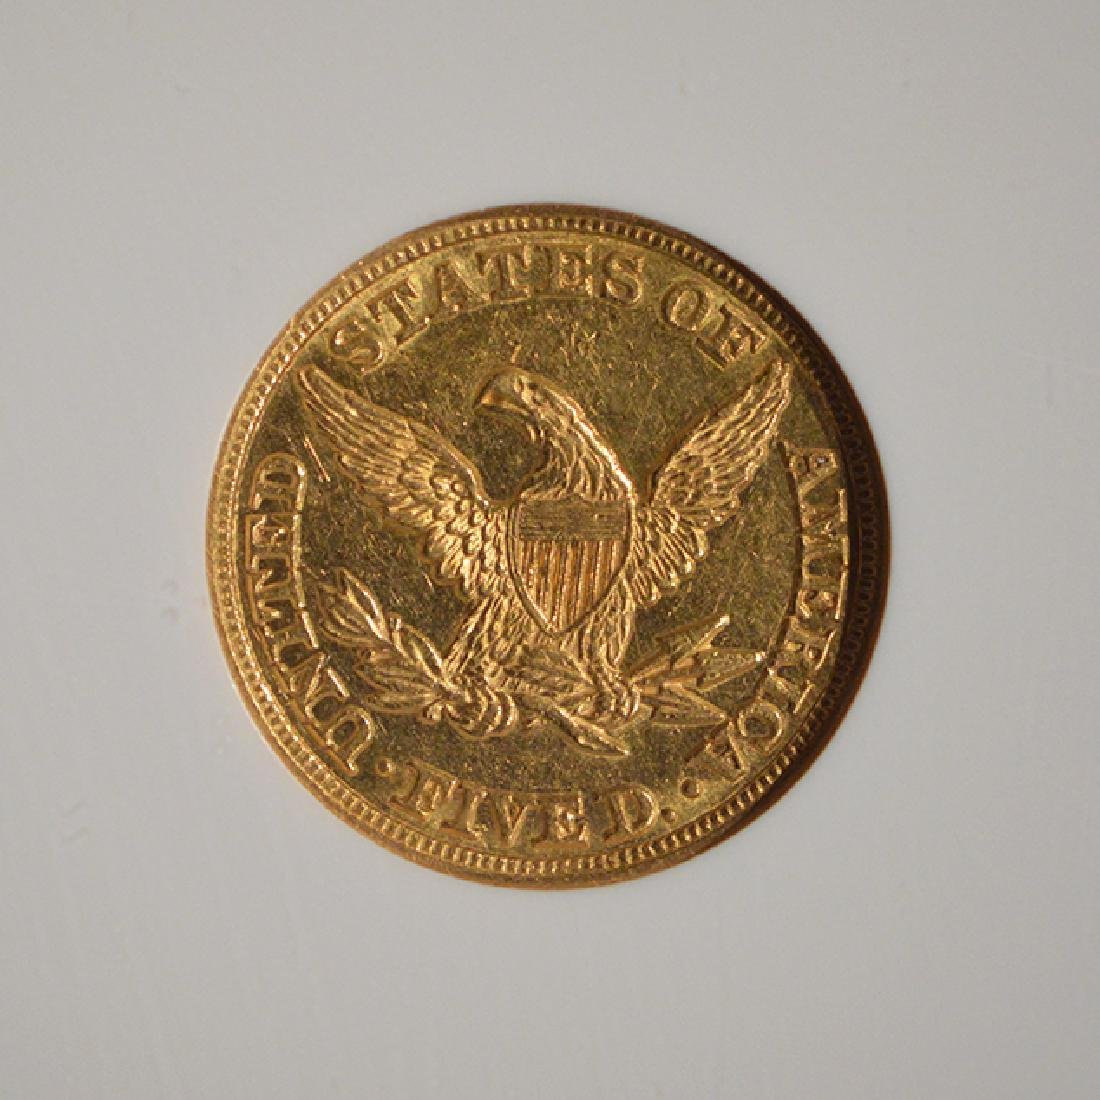 1847 $5 Liberty Head Half Eagle Gold Coin NGC AU58 - 4